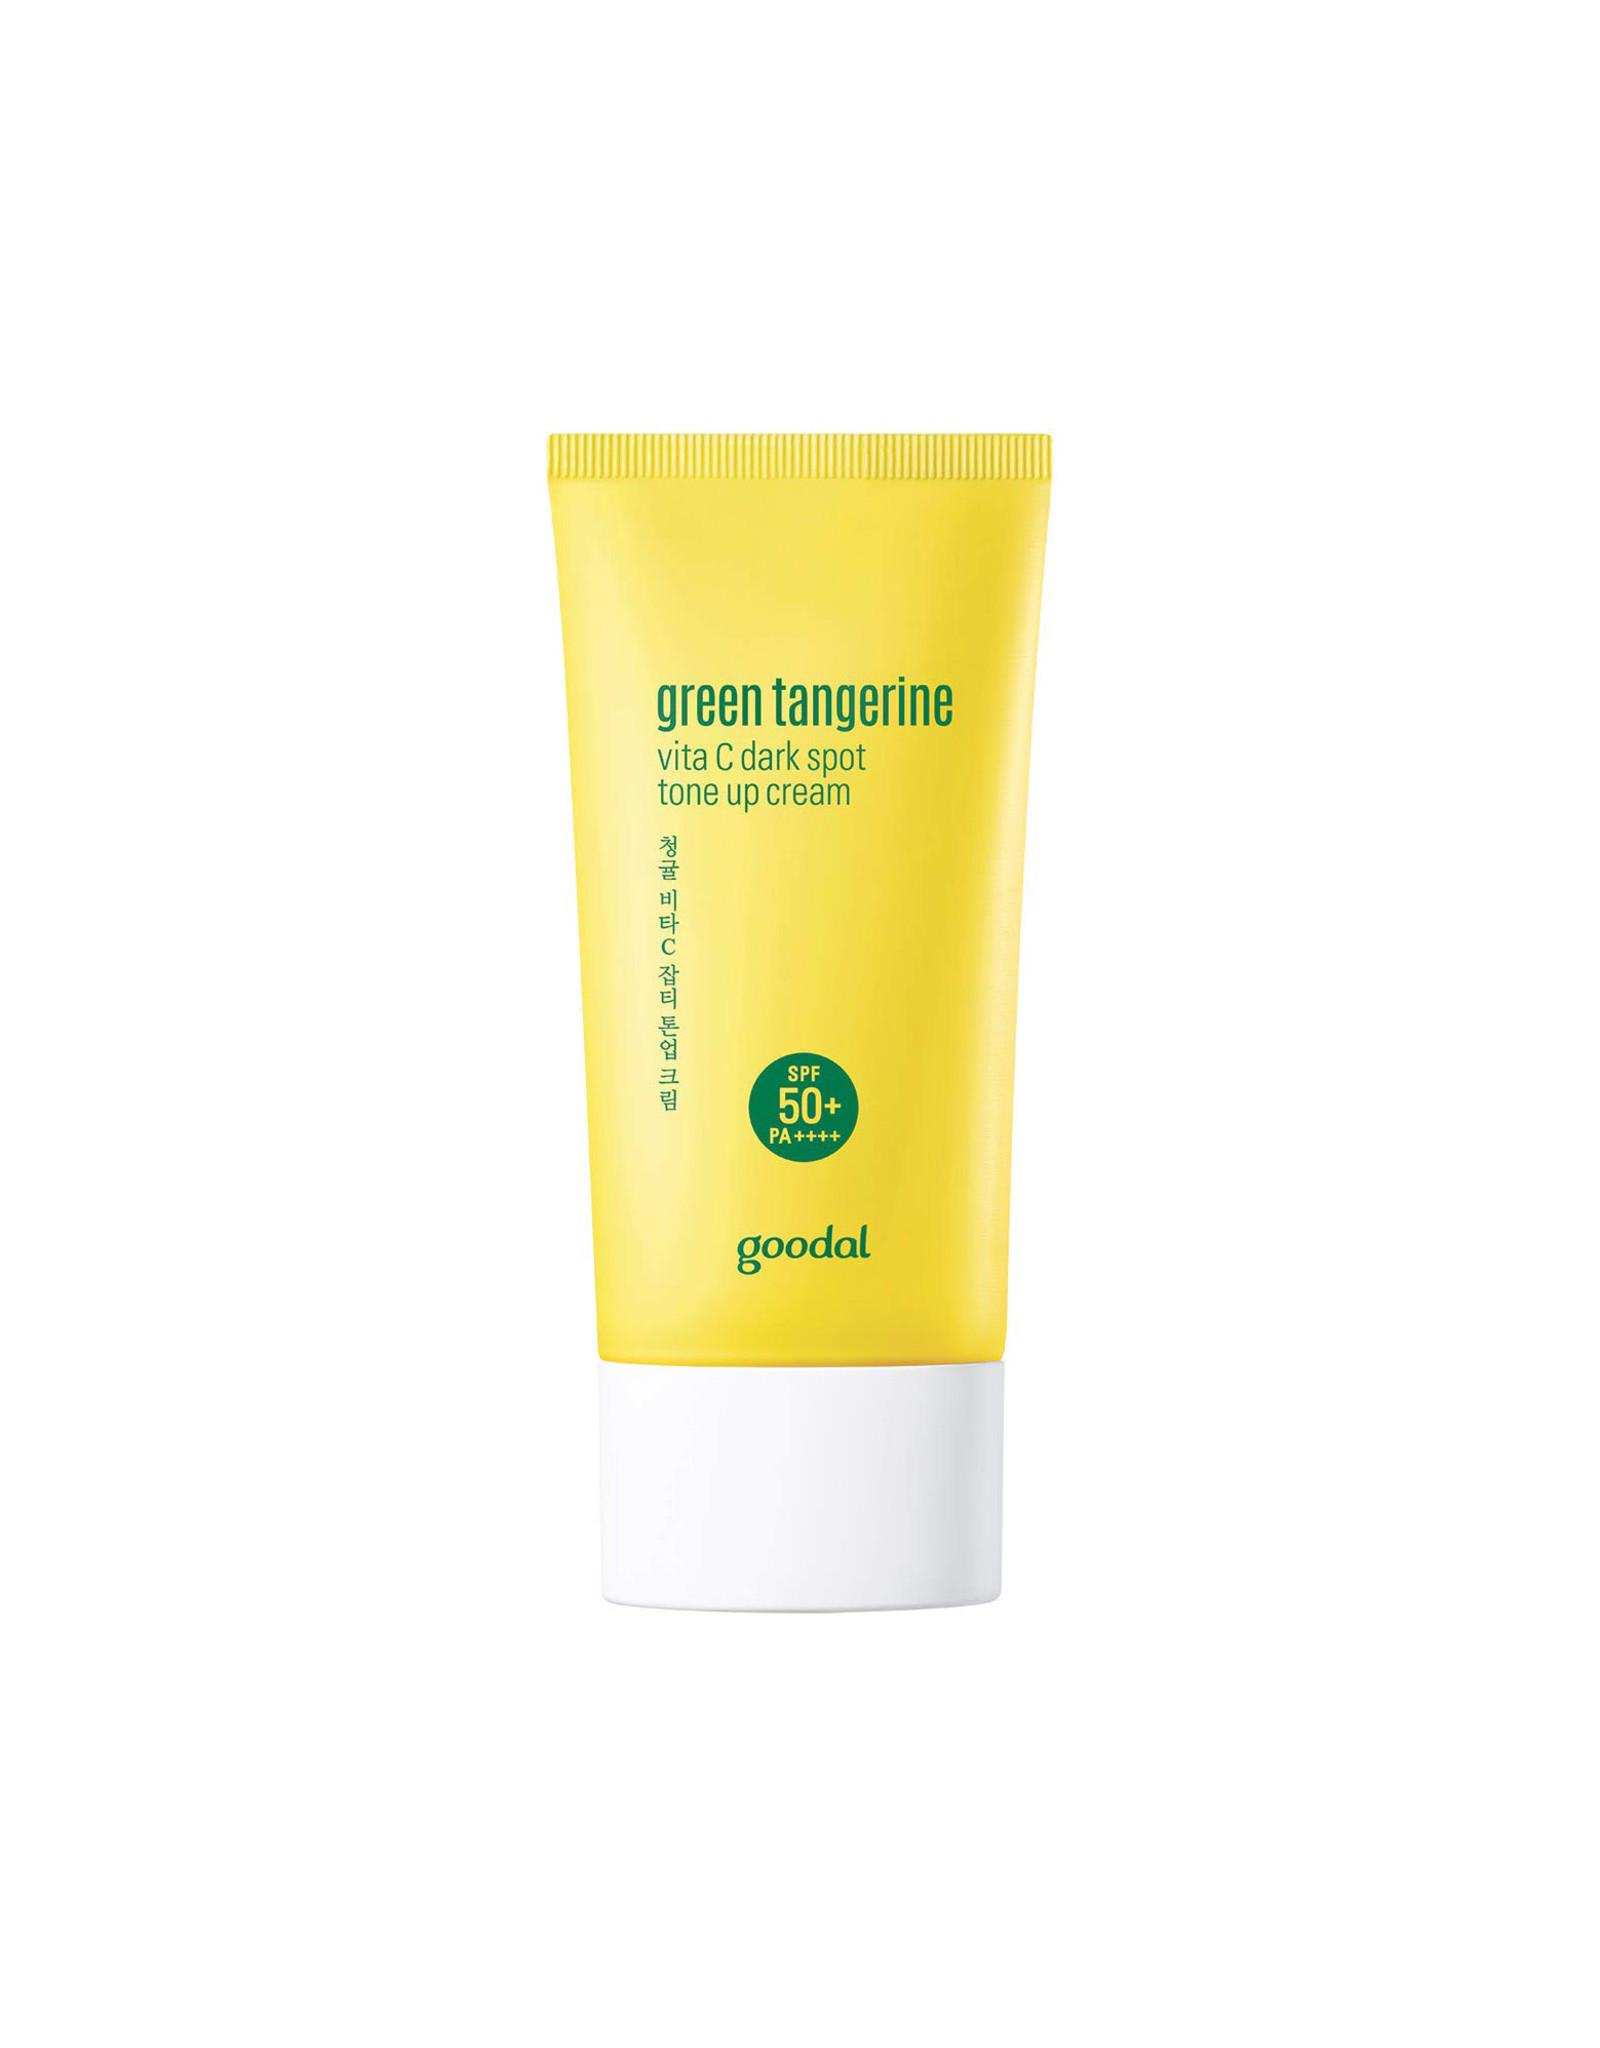 Goodal Goodal Green Tangeriene VC Tone Up Cream 88g